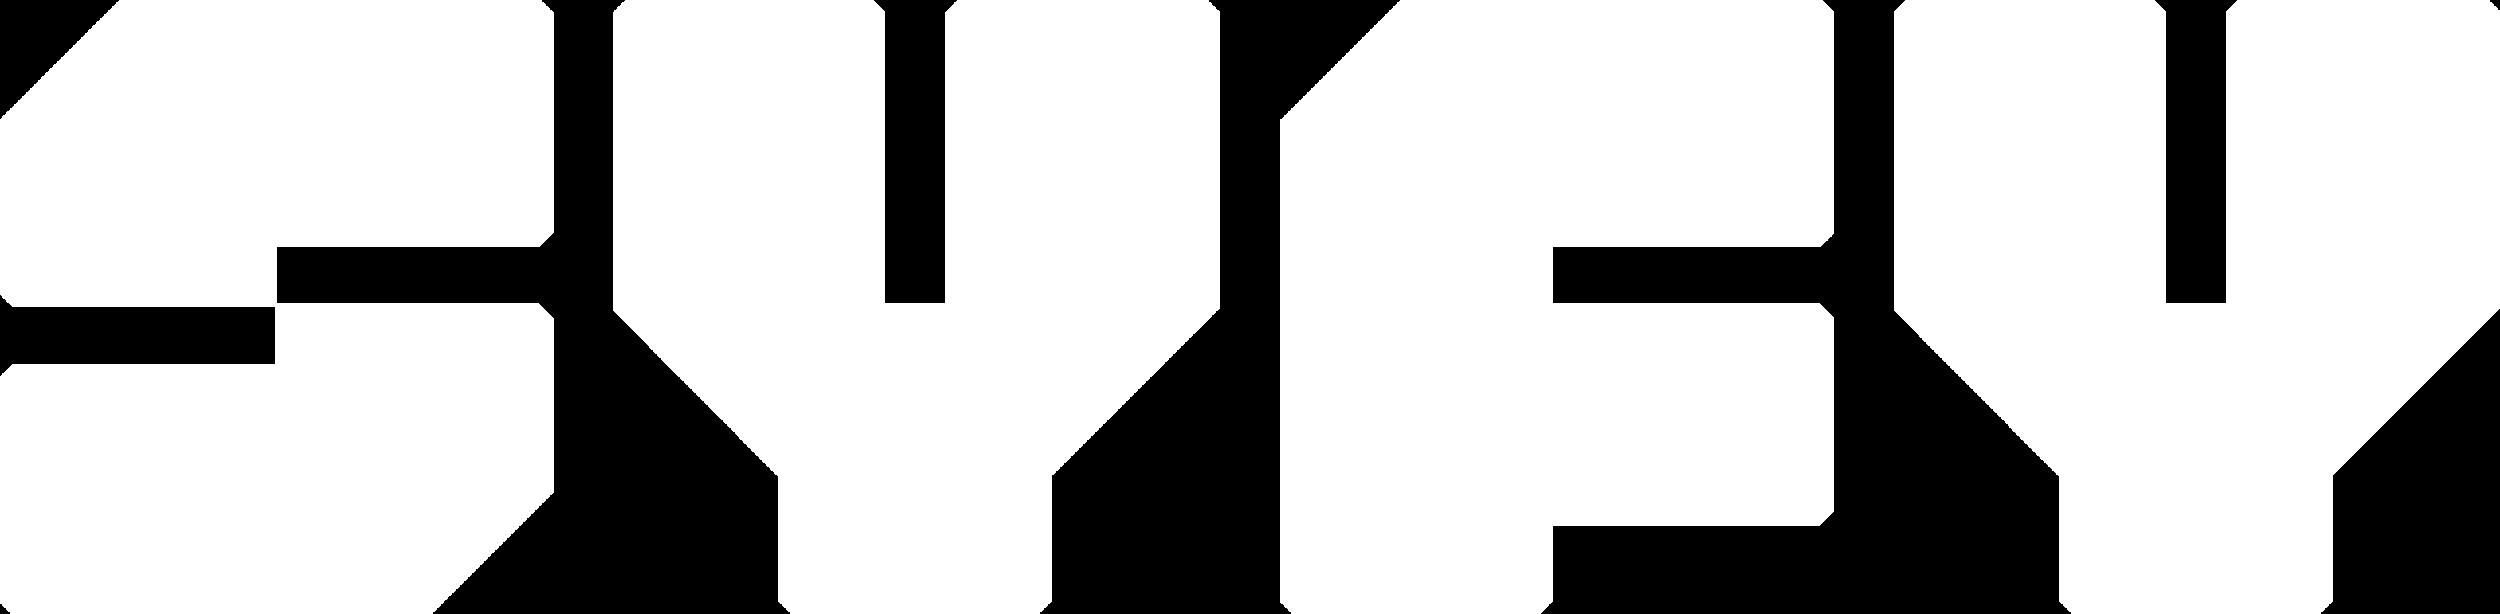 syfy-logo-2017.png